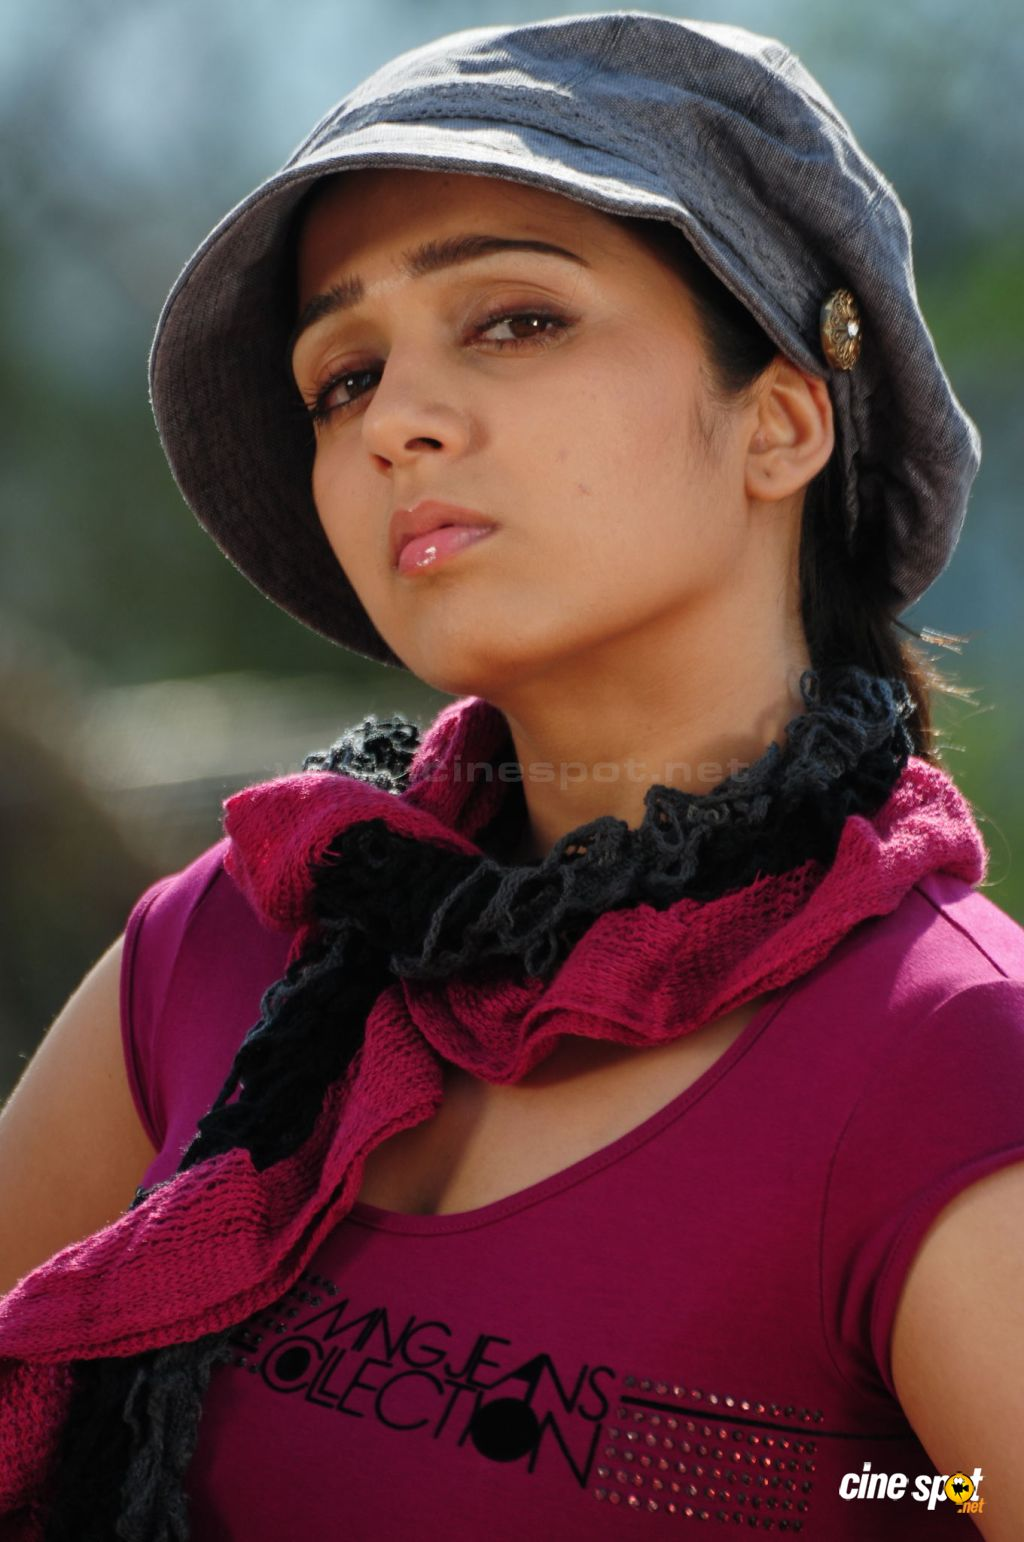 Cinecorner Telugu Actress Charmi Wallpapers